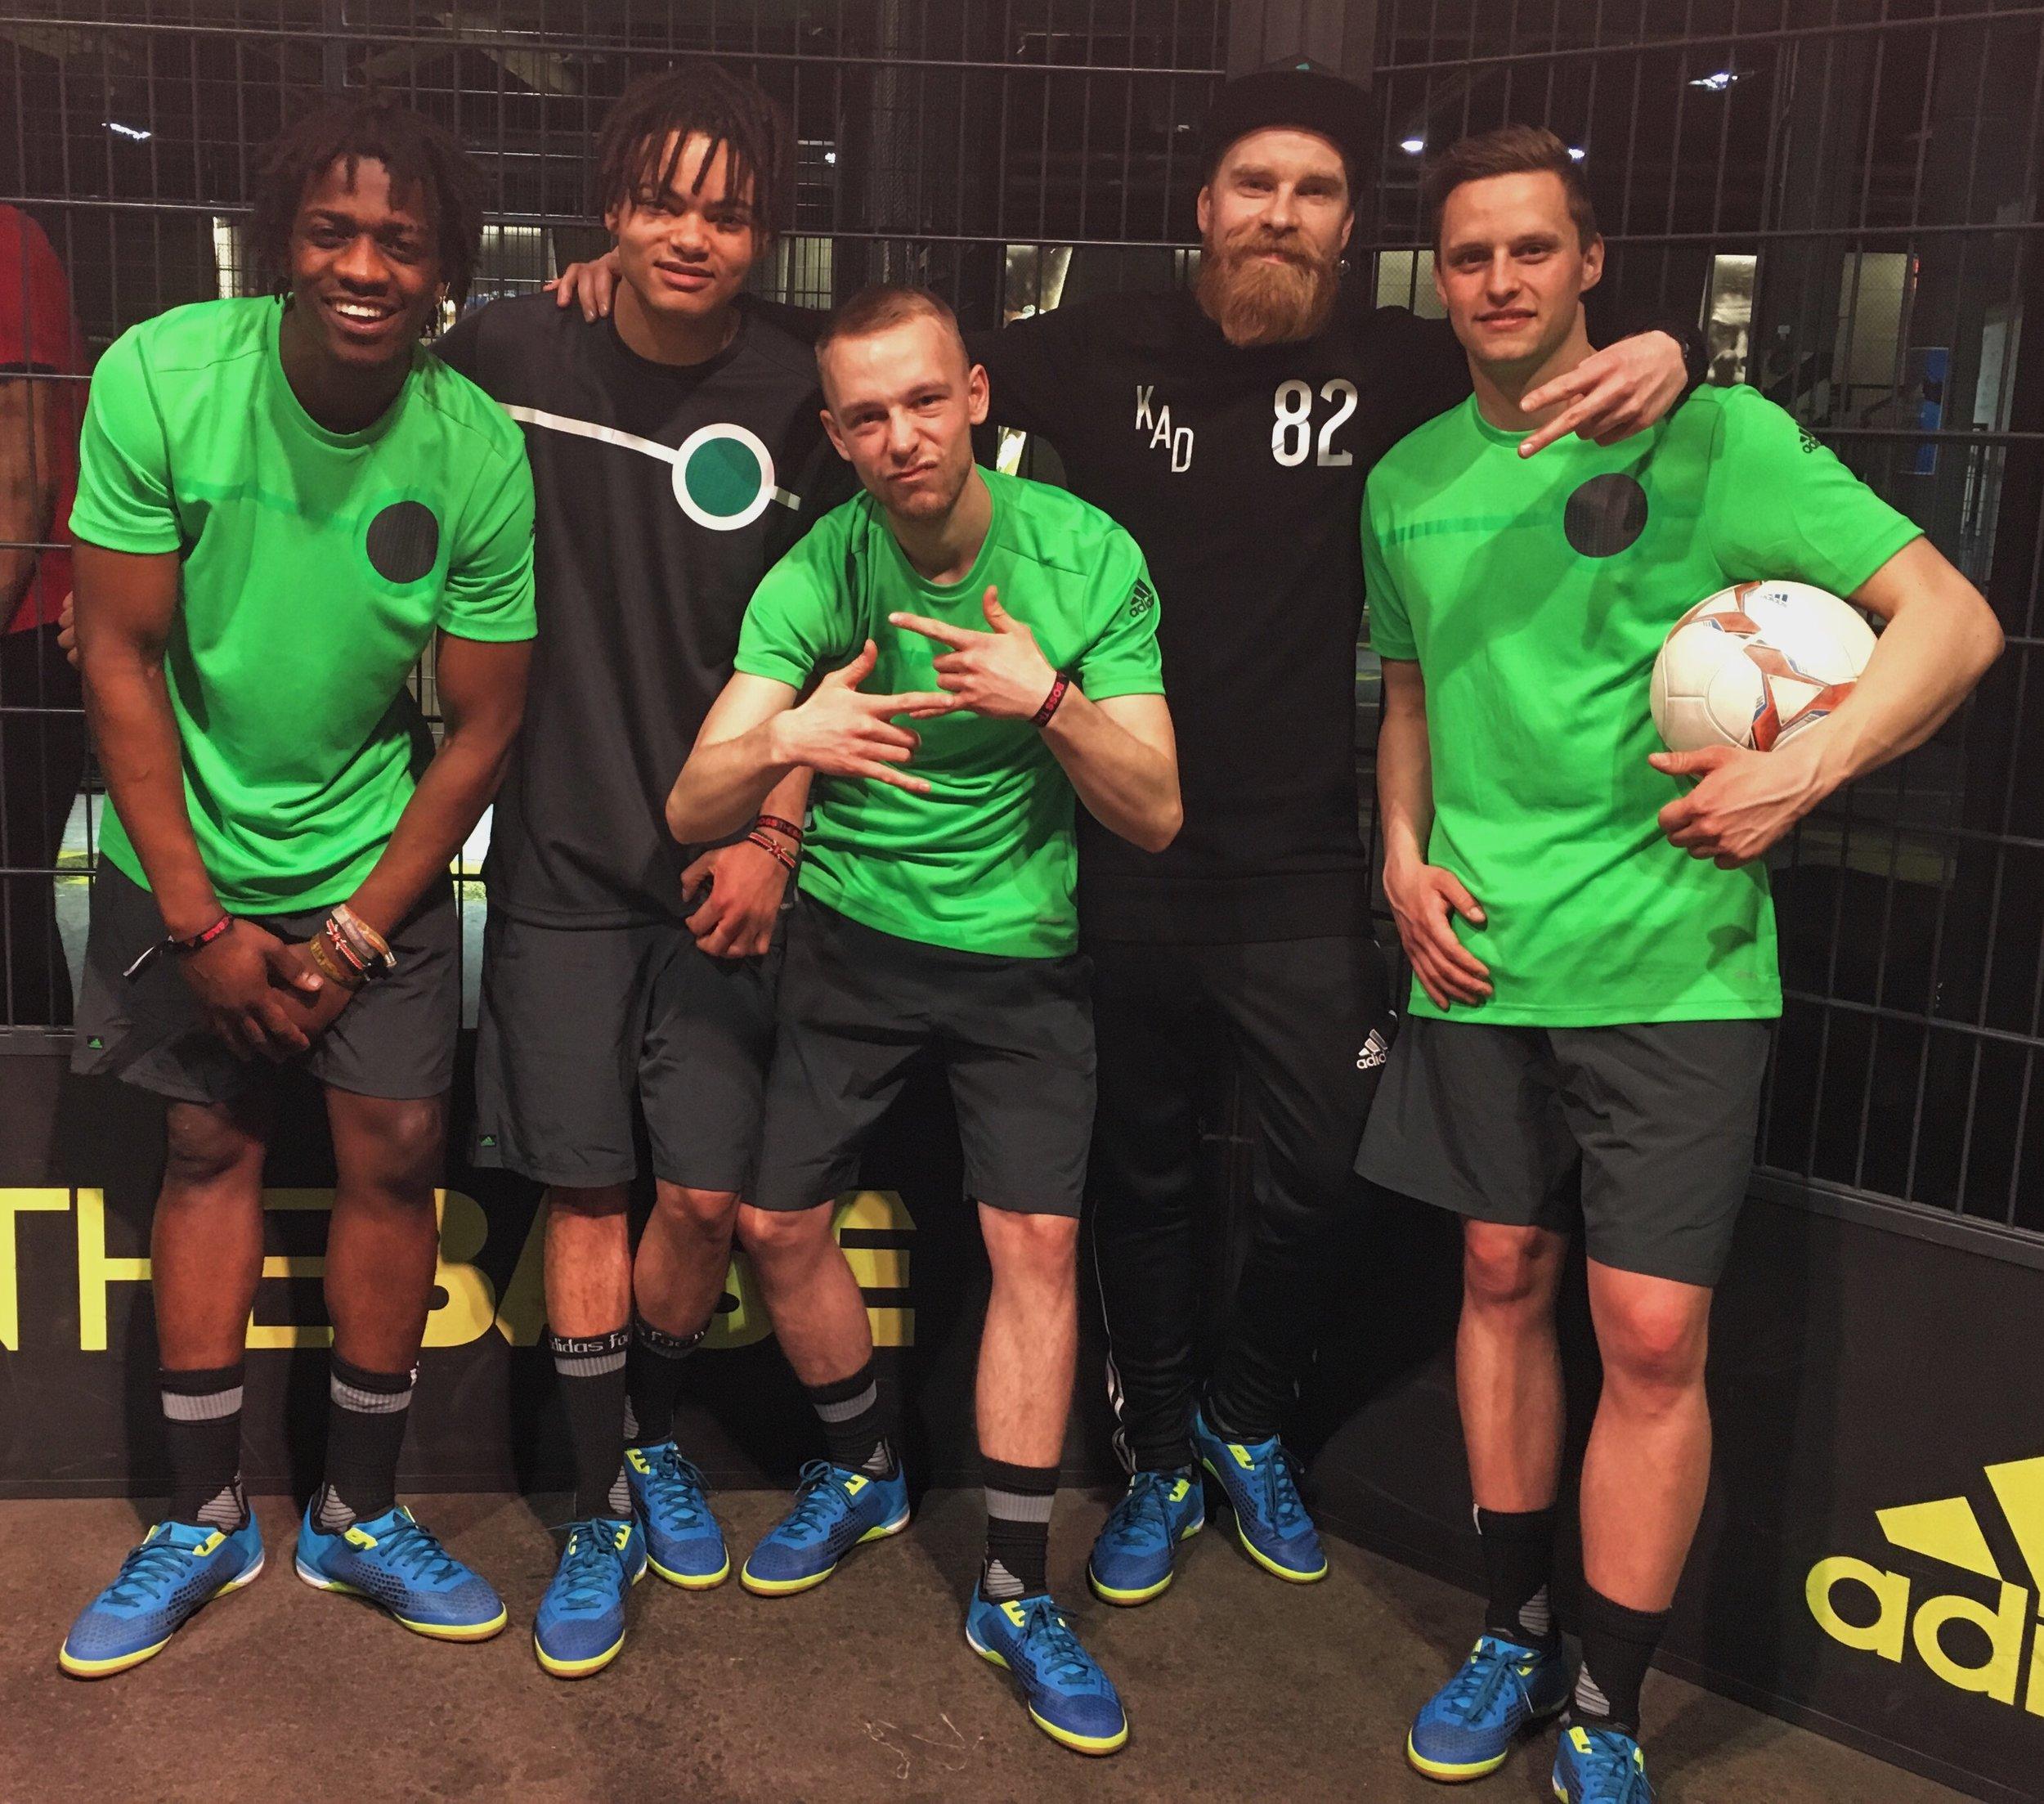 Adidas - The Base - Panna Event